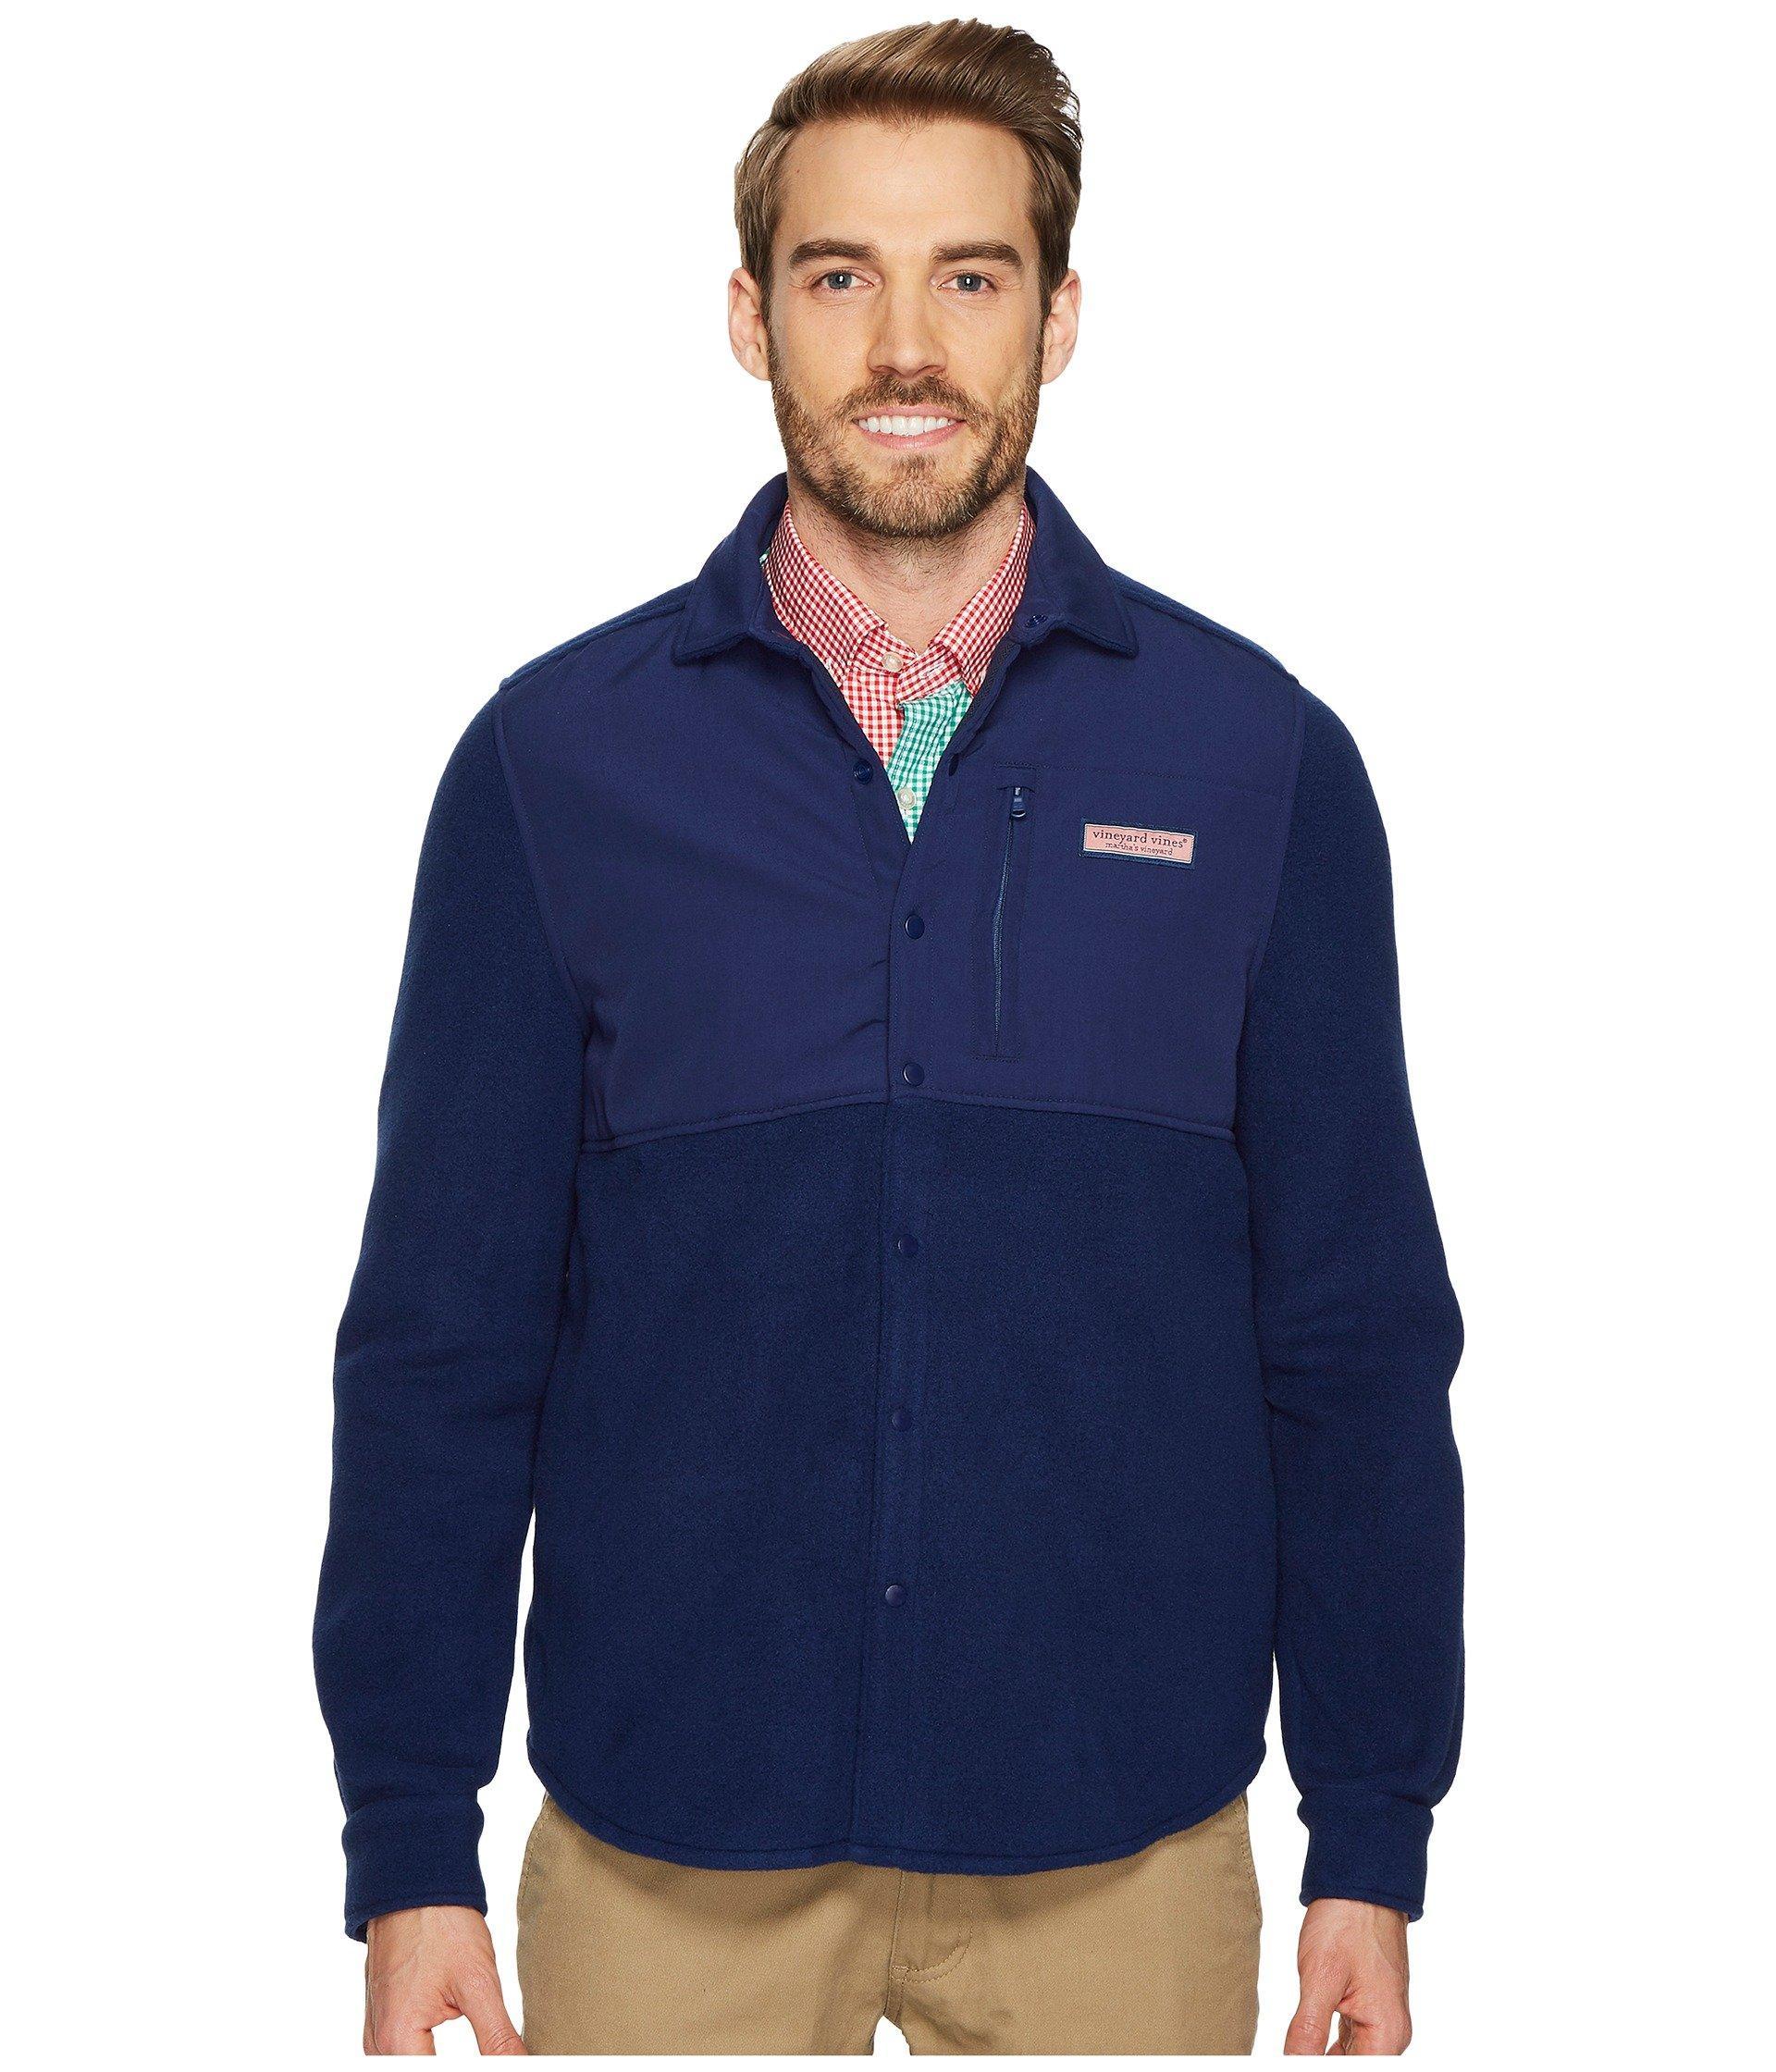 Vineyard Vines Shirt Jacket Snap Fleece In Deep Bay